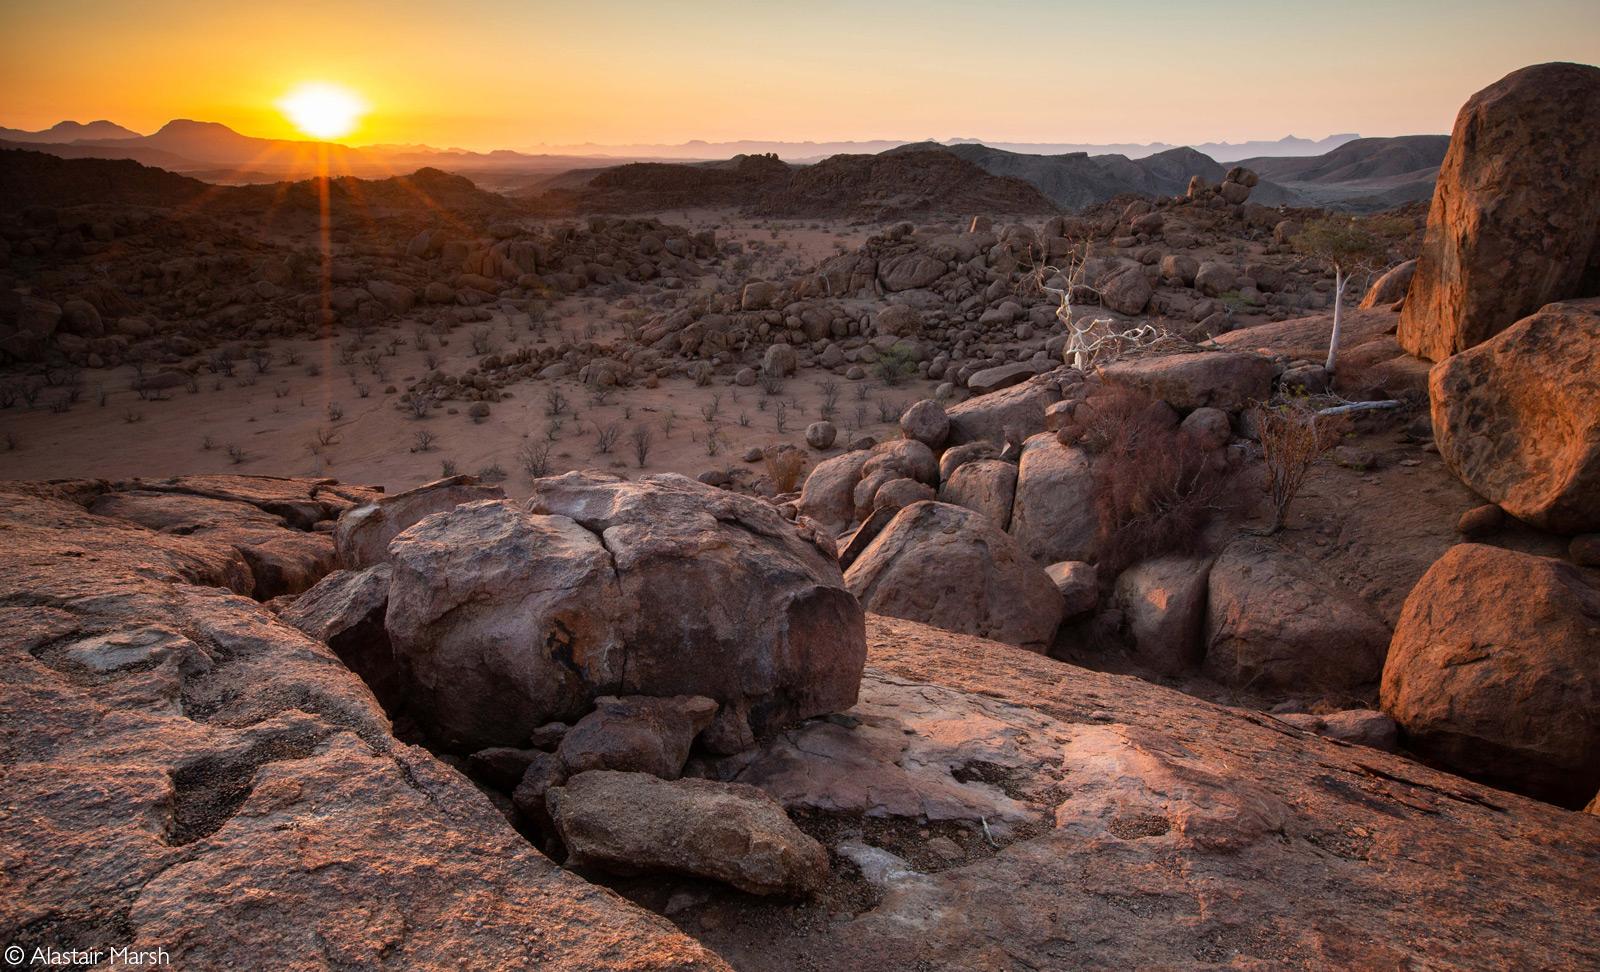 Sunset across the Namib Desert from Mowani Mountain Camp. Damaraland, Namibia © Alastair Marsh